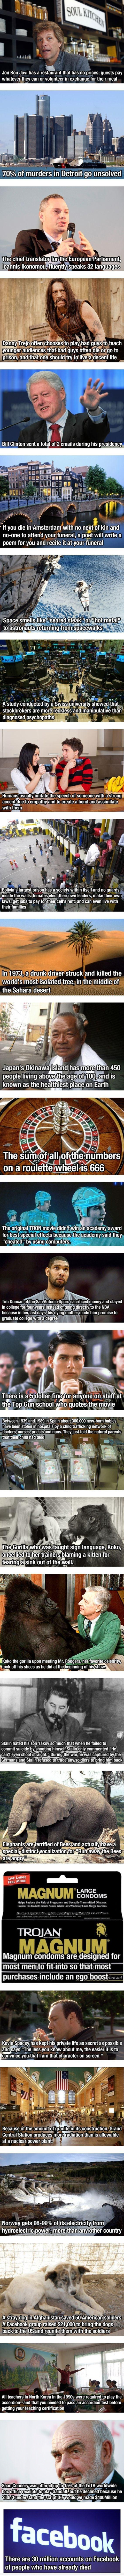 30 Random Facts